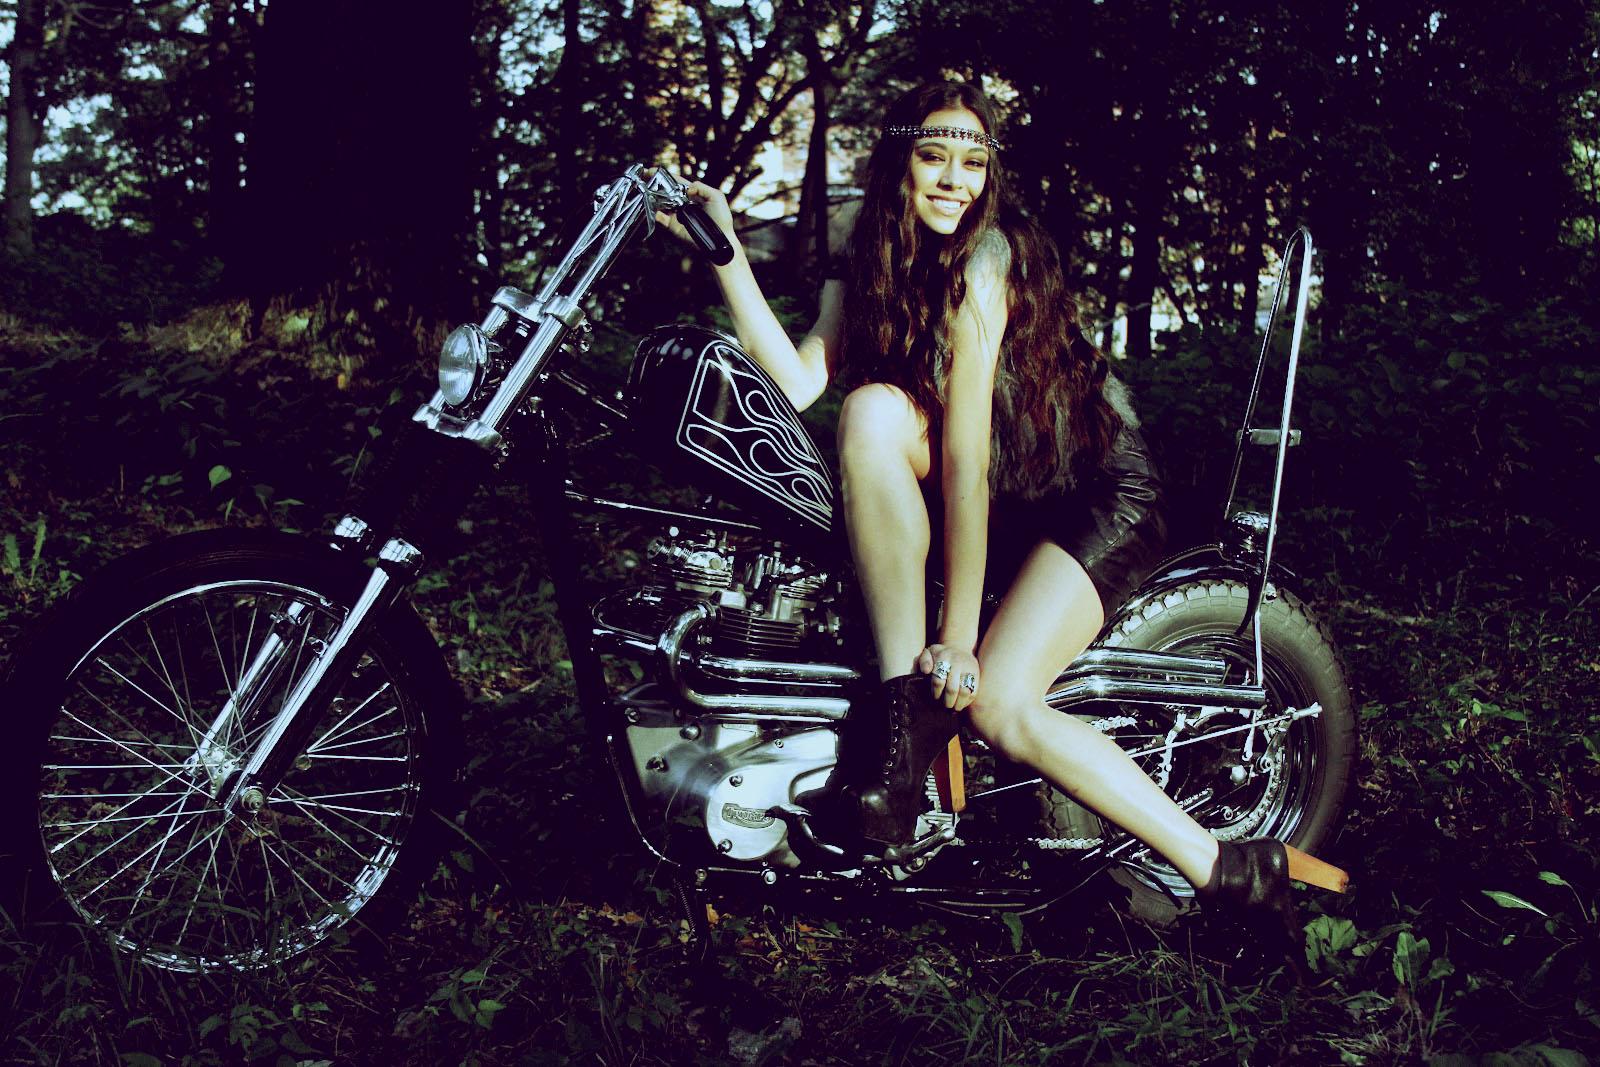 chopper motorcycle girl Chopper Girl 1600x1067